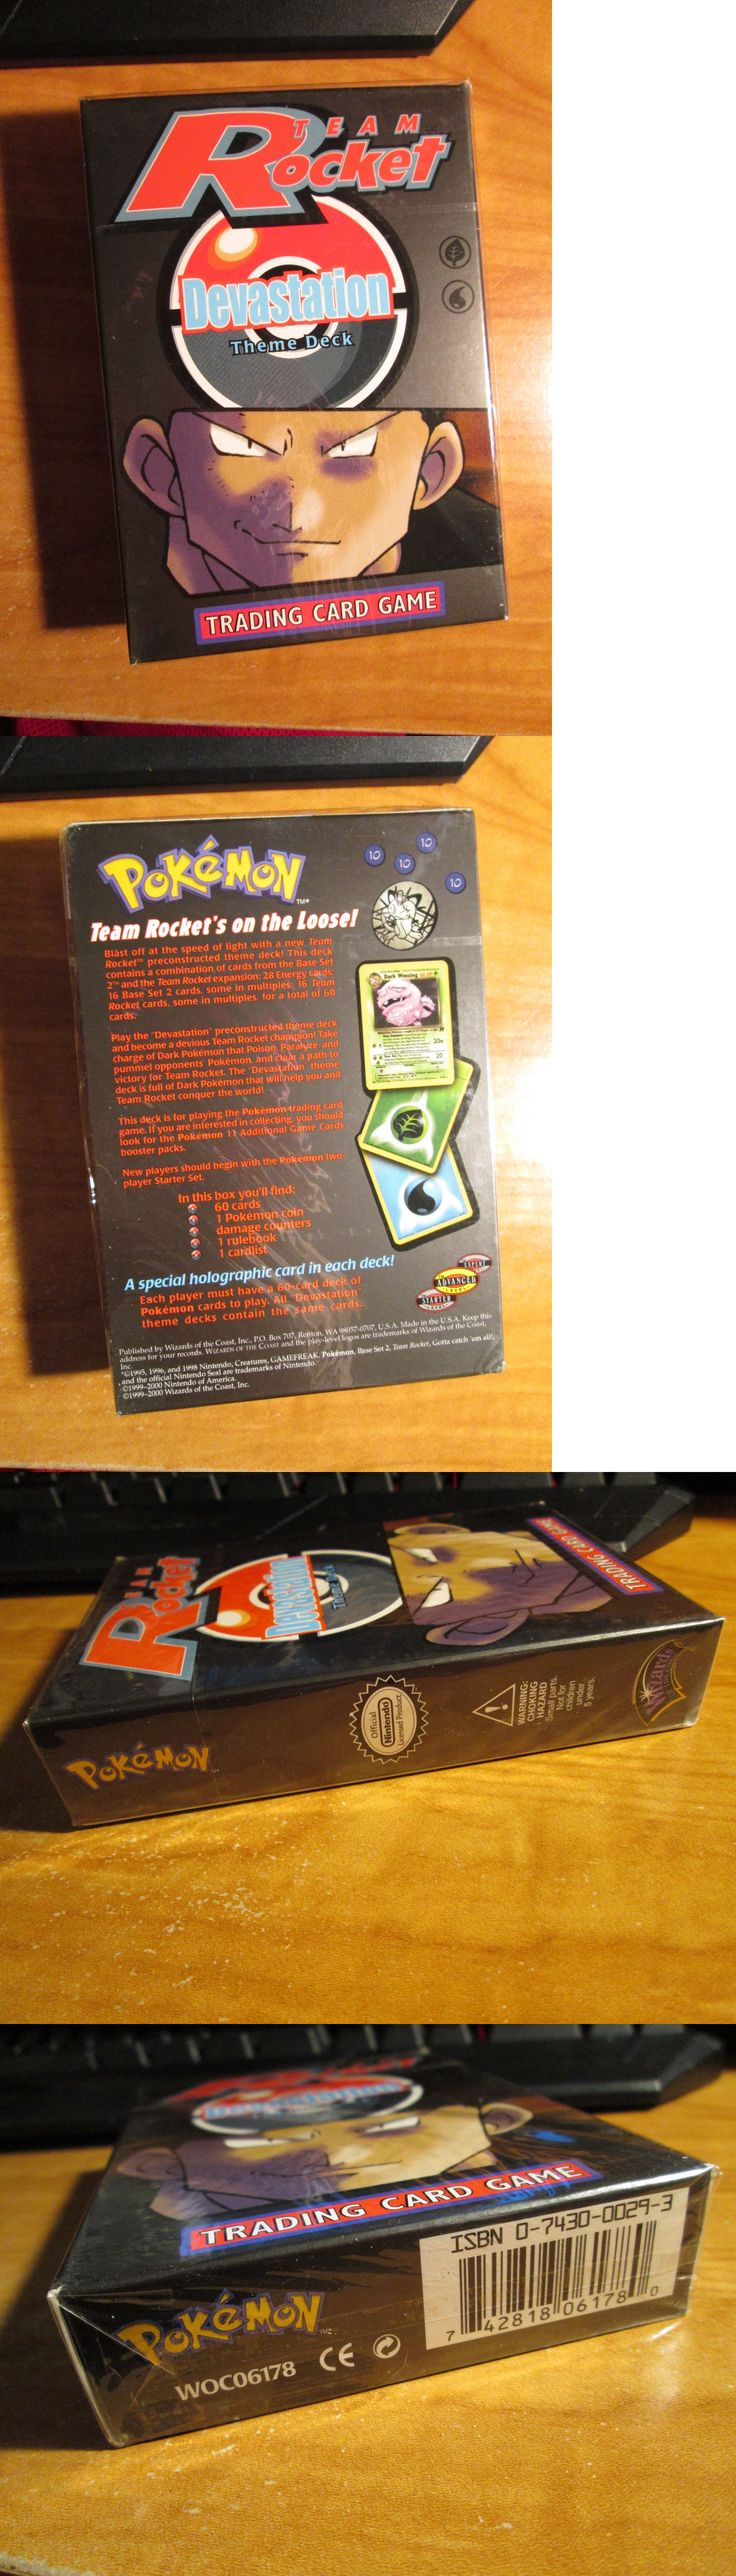 Pok mon Complete Sets 104046: Sealed Complete Pokemon Devastation Card Team Rocket Set Theme Deck Holo Weezing -> BUY IT NOW ONLY: $34.99 on eBay!